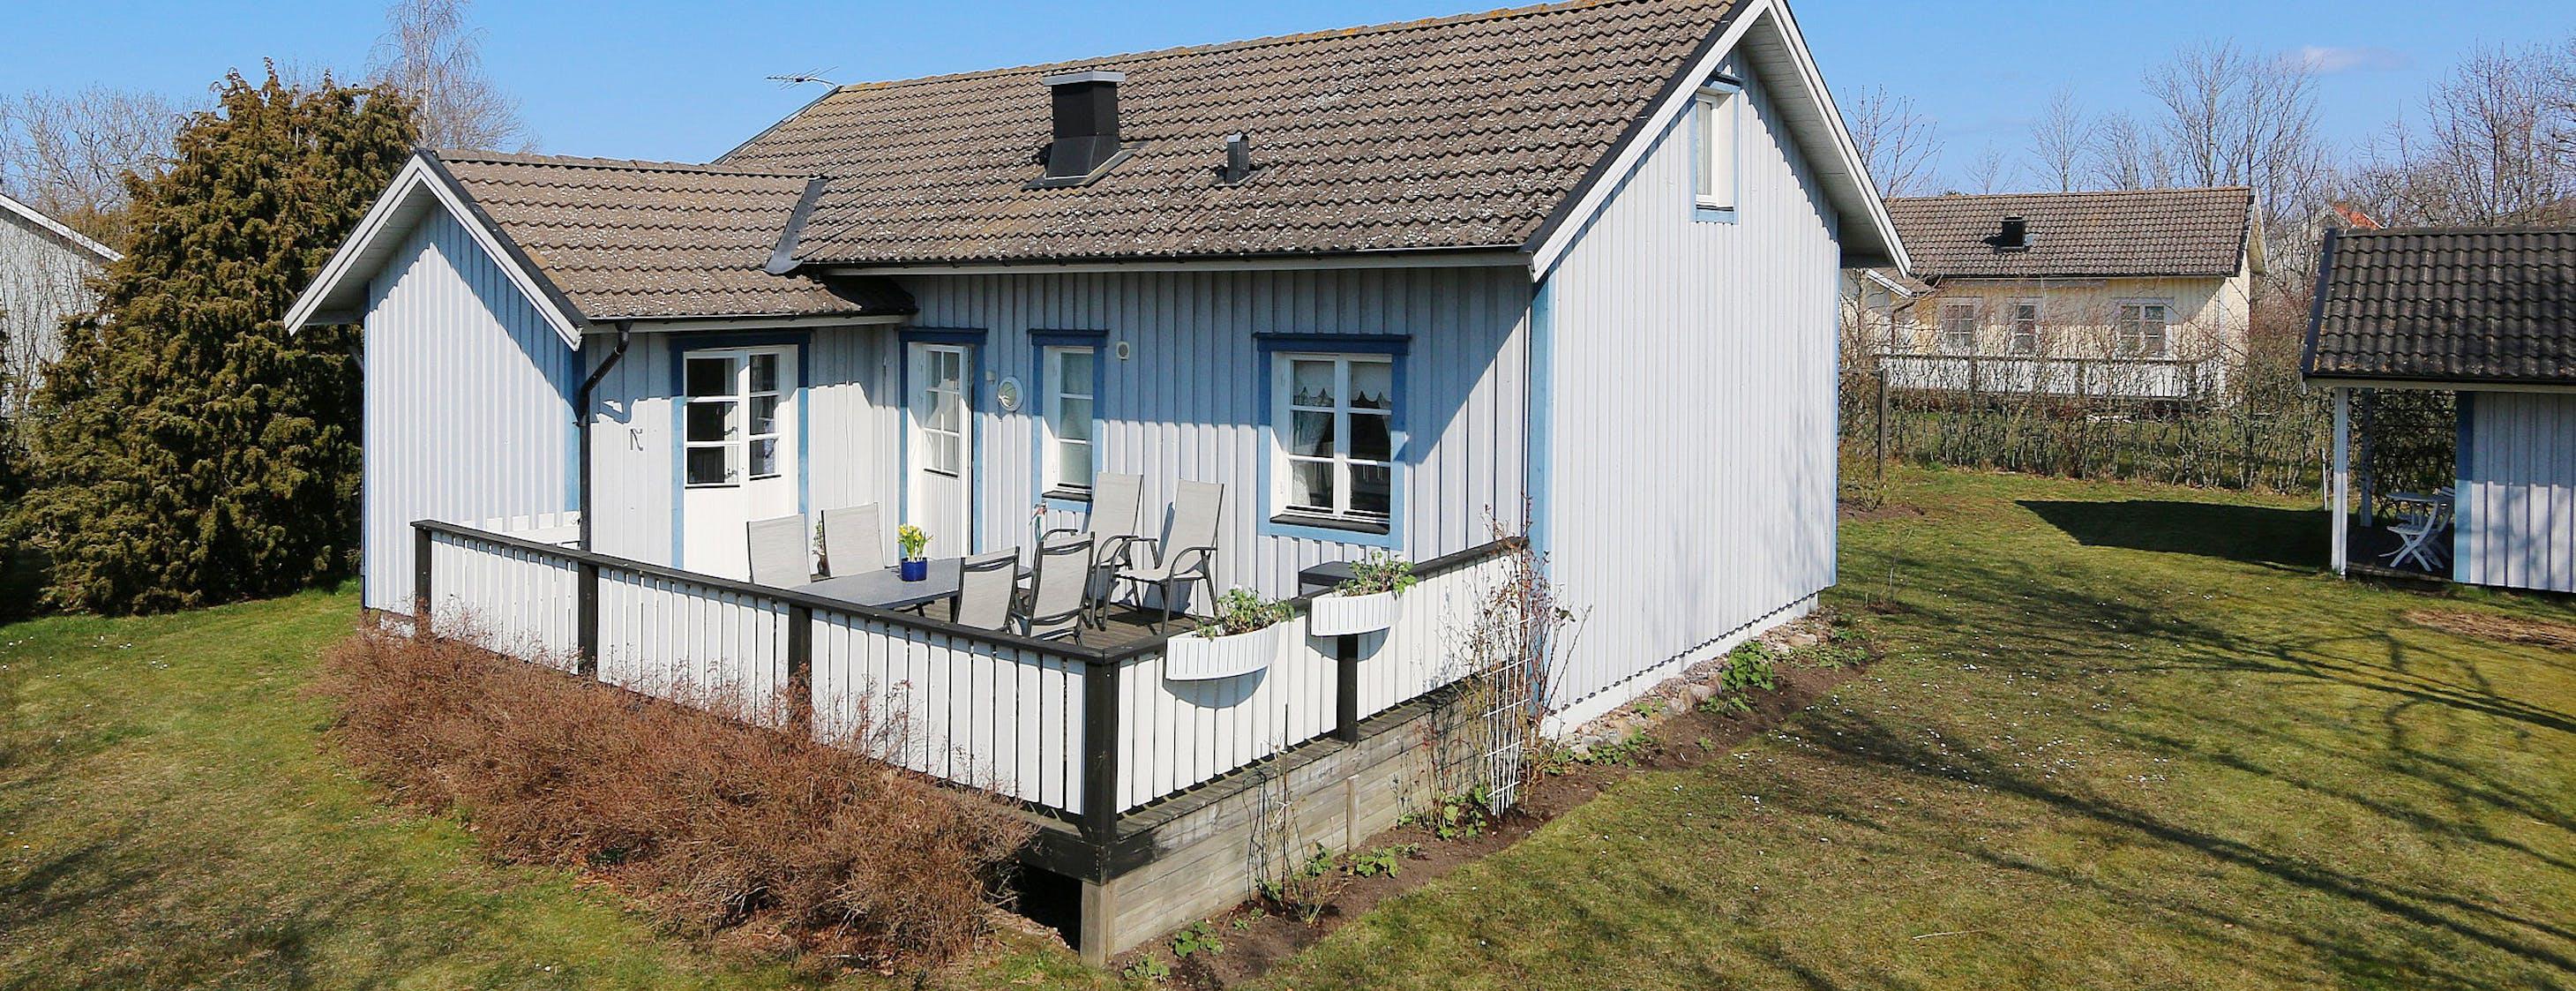 Södra Emmetorpsgatan 17 Emmetorp